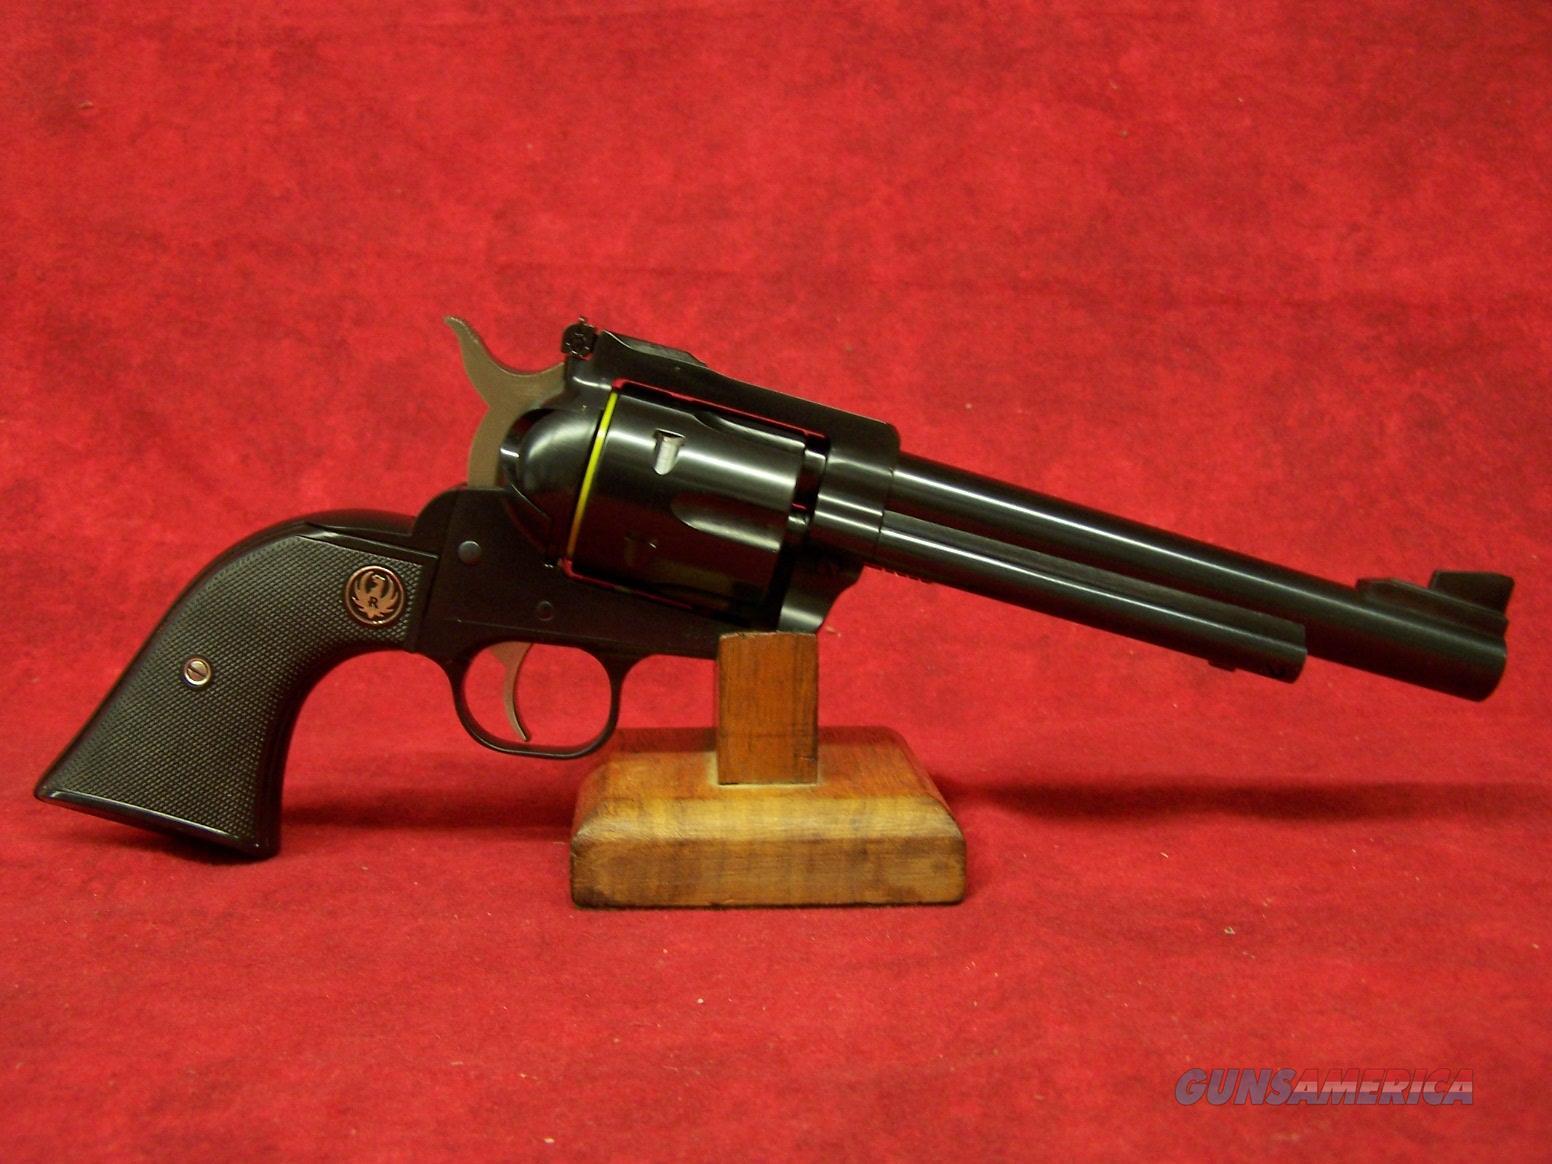 Ruger Blackhawk Convertible .357 Magnum/9mm 6.5 Inch Barrel Blue Finish (0318)  Guns > Pistols > Ruger Single Action Revolvers > Blackhawk Type